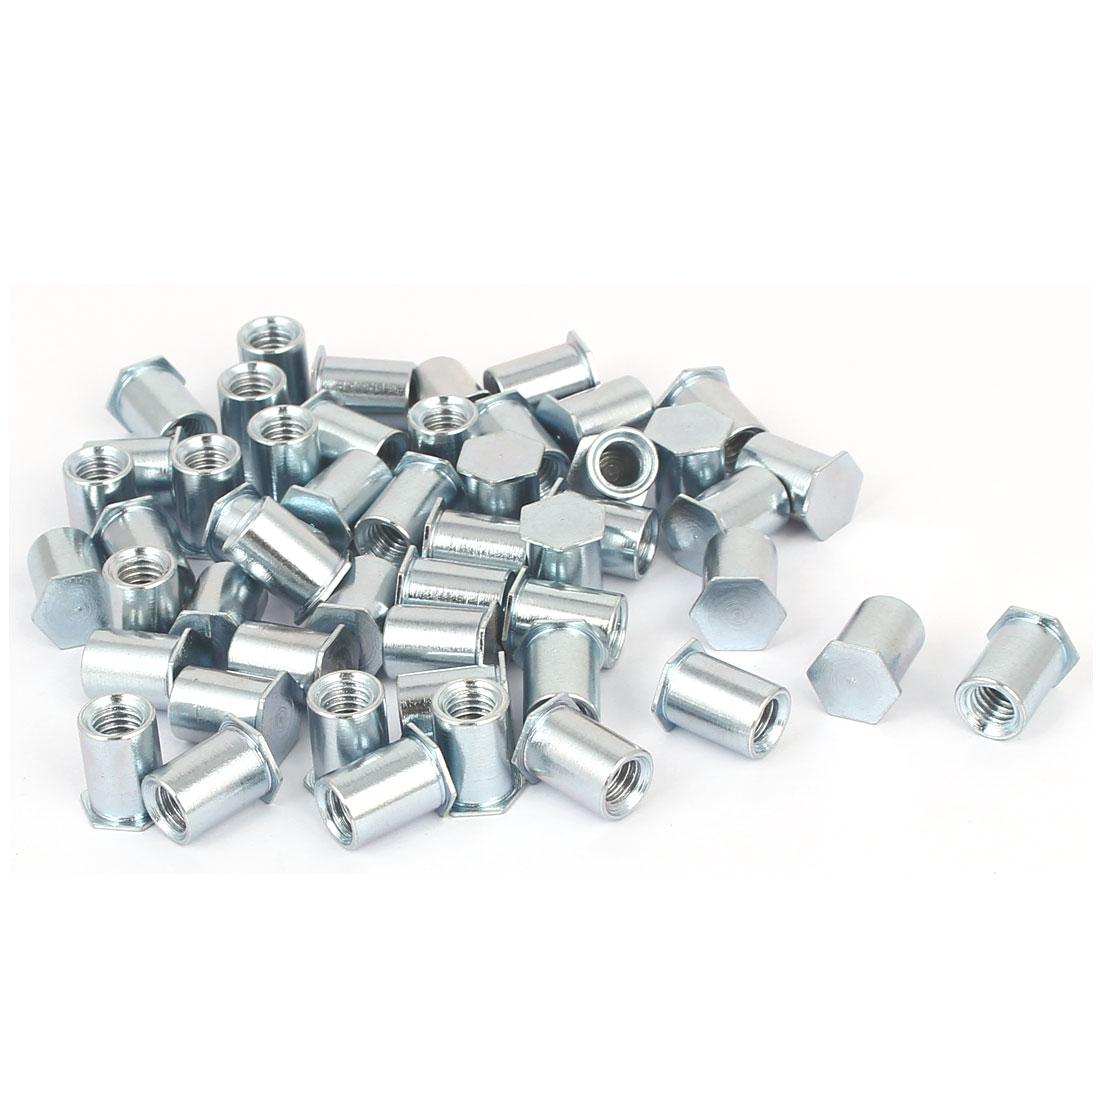 M5x10mm-Hex-Head-Zinc-Plated-Carbon-Steel-Blind-Self-Clinching-Standoff-50pcs